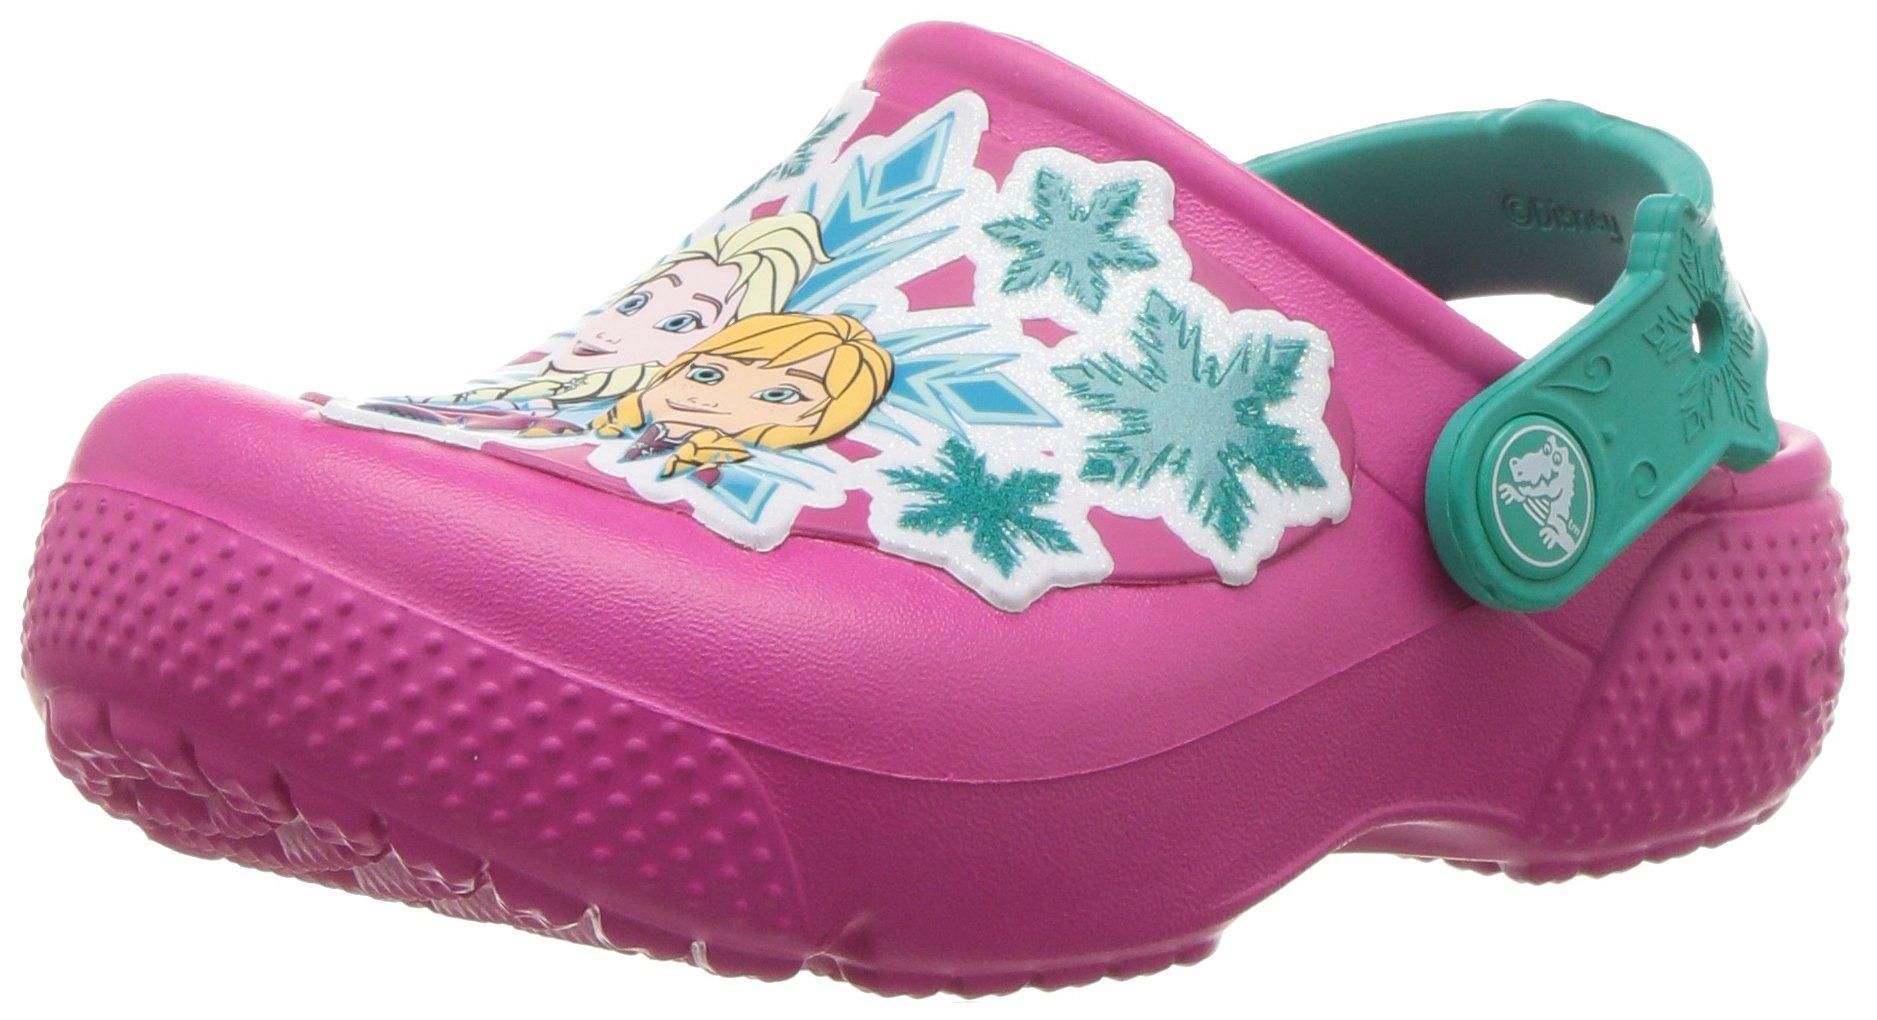 Crocs Girls' Fun Lab Frozen Clog K, Candy Pink, 10 M US Little Kid by Crocs (Image #1)